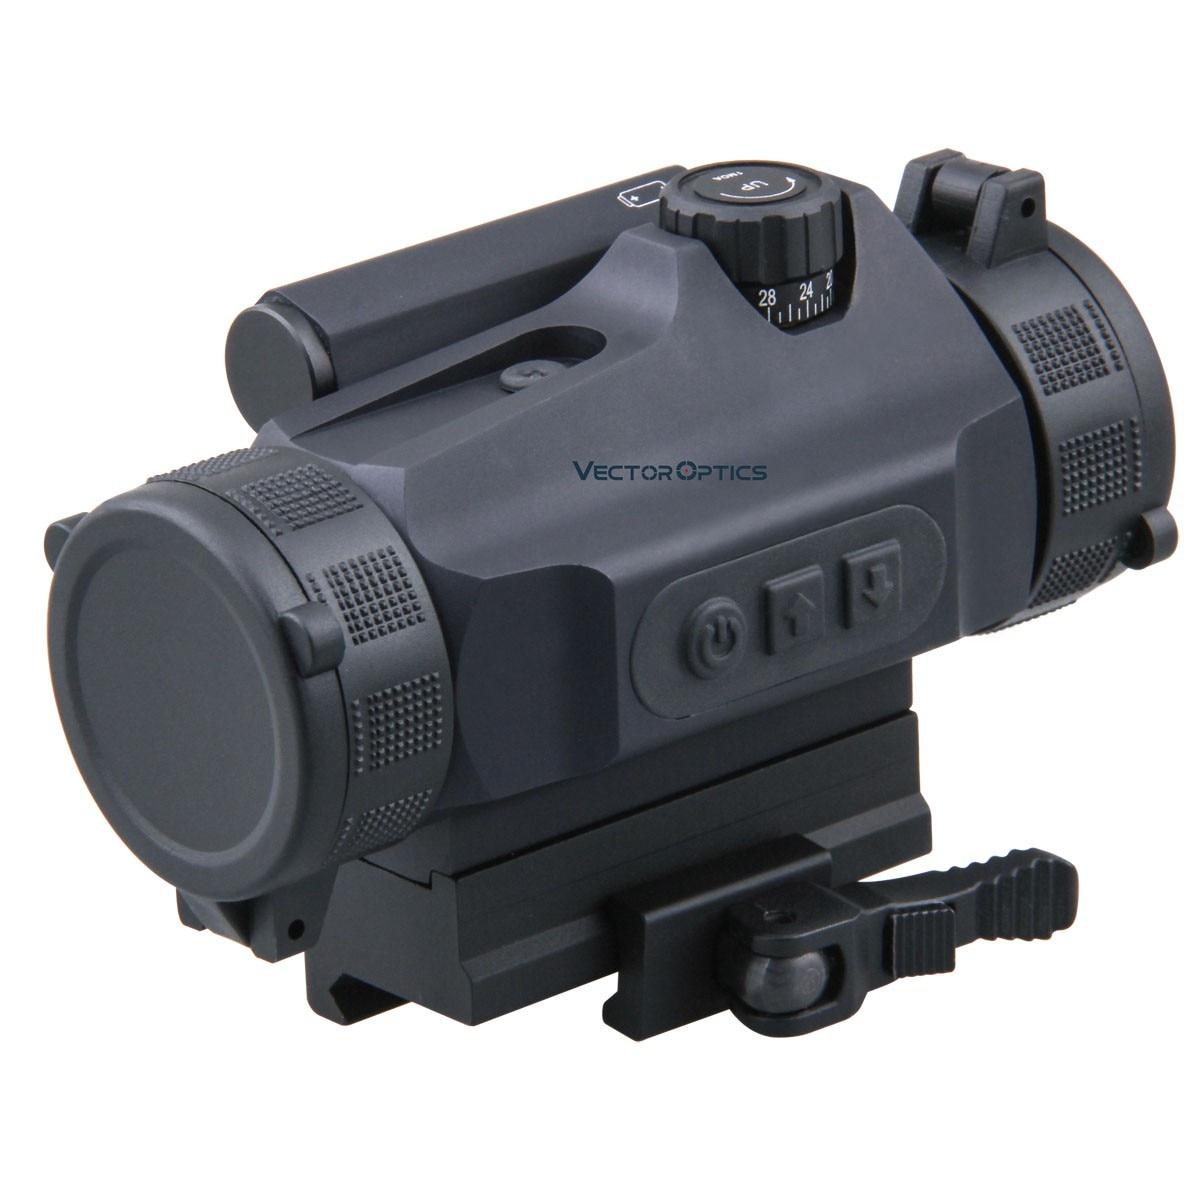 Vector Optics Nautilus 1x30 GenII Red Dot Sight 3MOA Dot Size 11 Levels Intensity Auto Light Sense Tactical Rifle Sight Fit AR15 enlarge